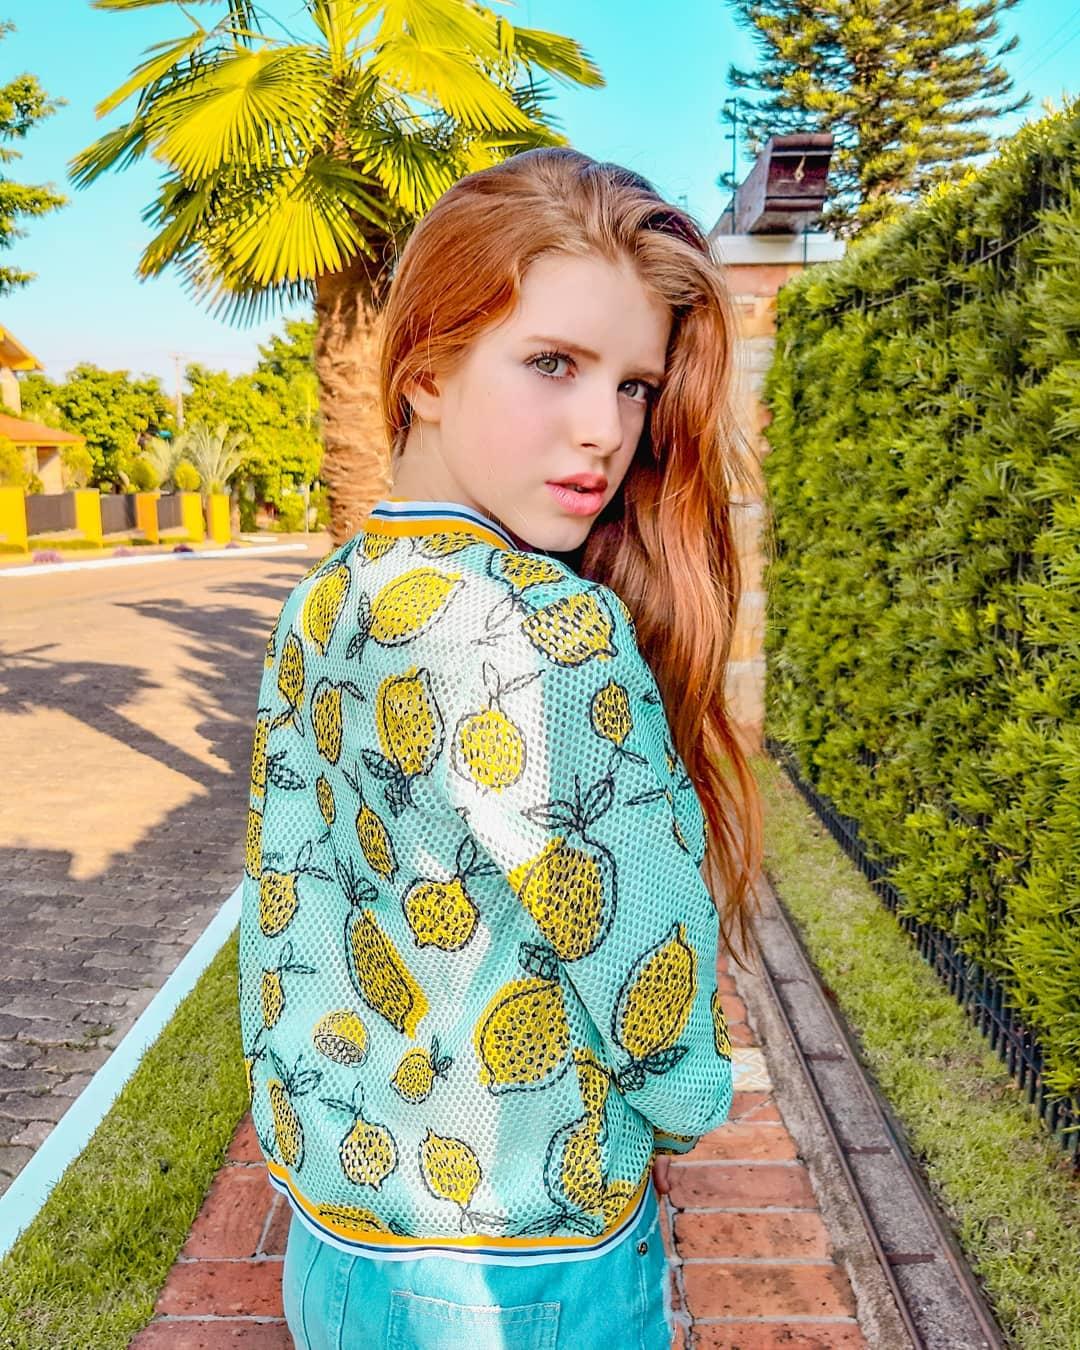 Julia-Vitoria-Mayer-Wallpapers-Insta-Fit-Bio-8